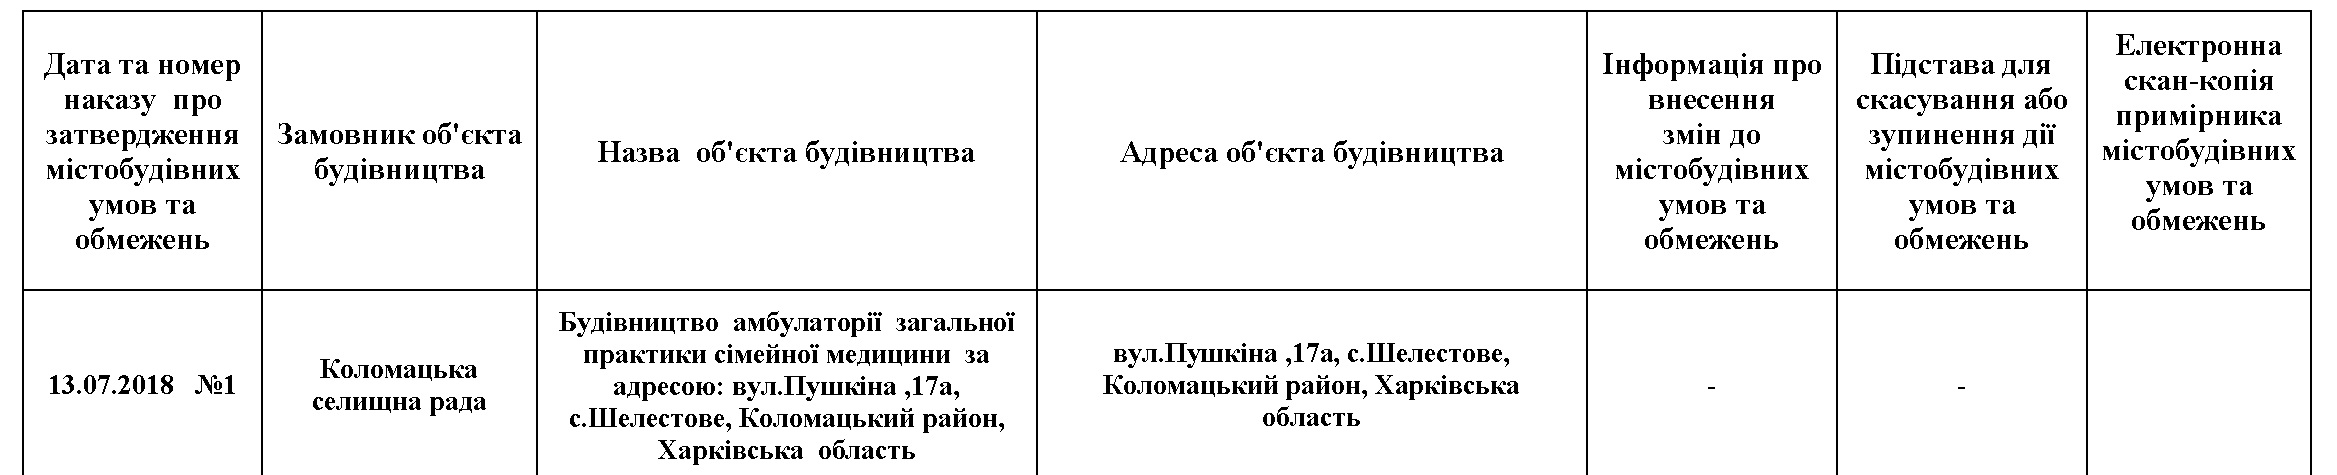 ОБМЕЖЕНЬ _1_